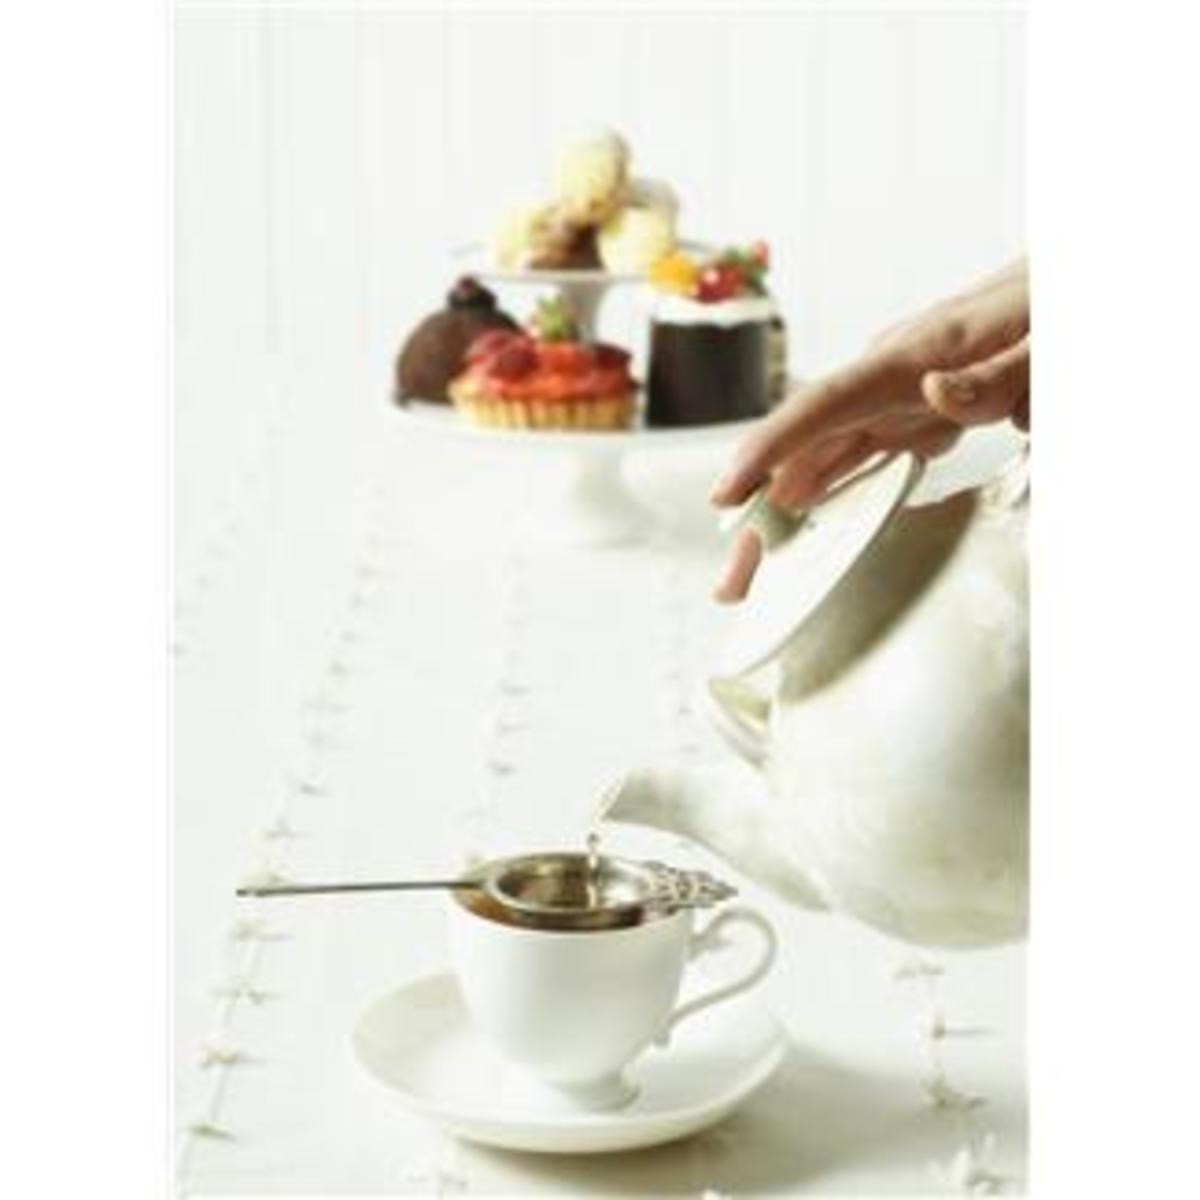 Make Herbal Tea: How to Prepare, Brew, and How Long to Steep St. John's Wort Tea